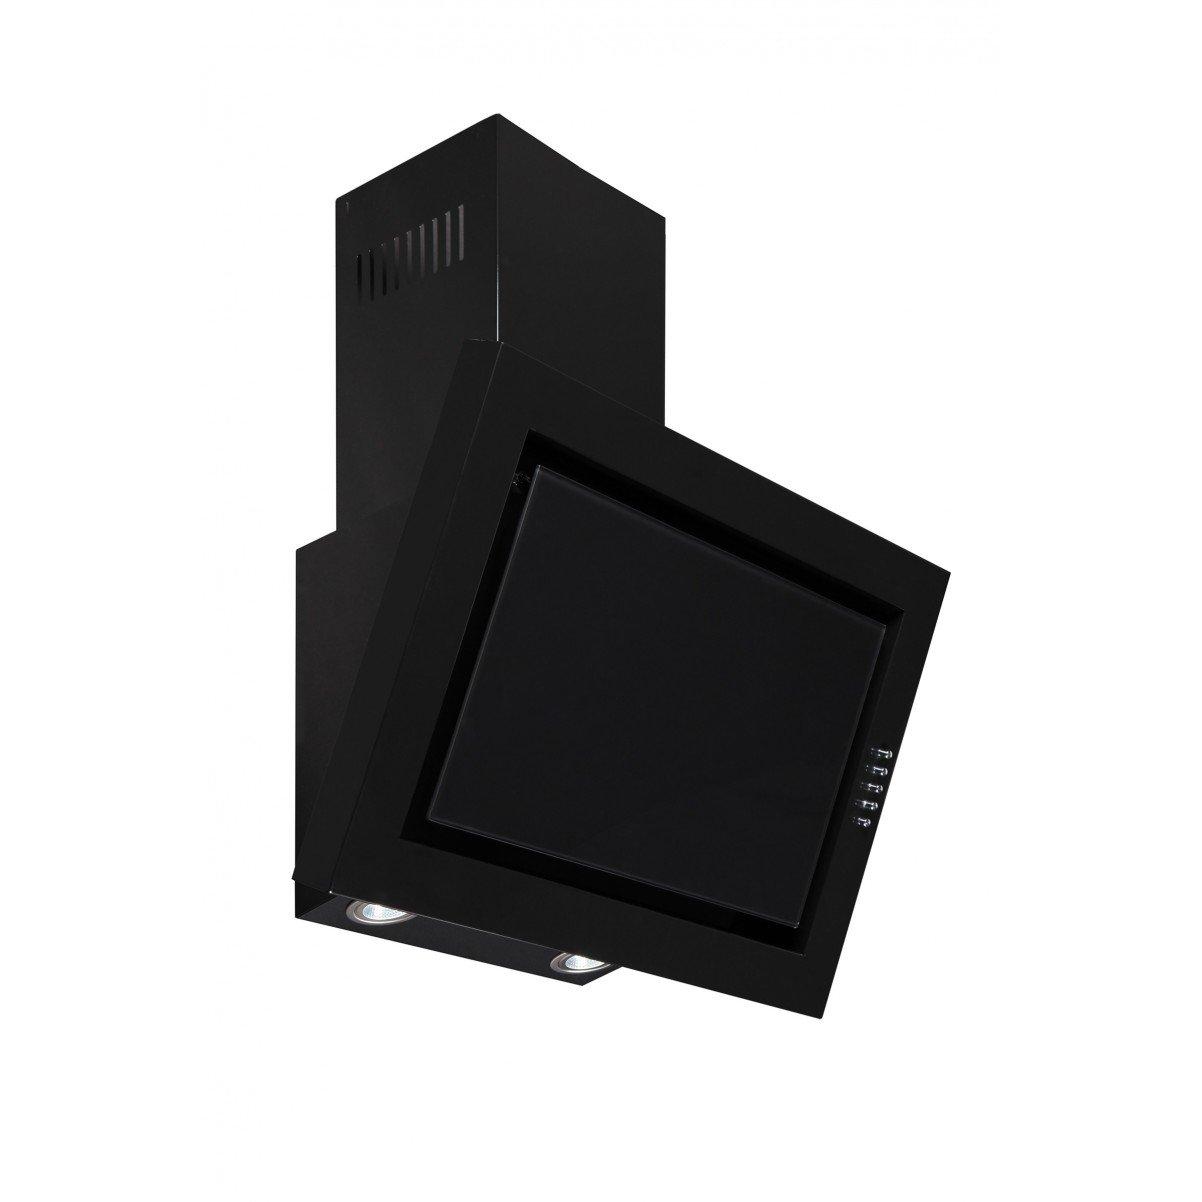 Vägghängd köksfläkt SIGMA svart 60cm/90cm +svart glas